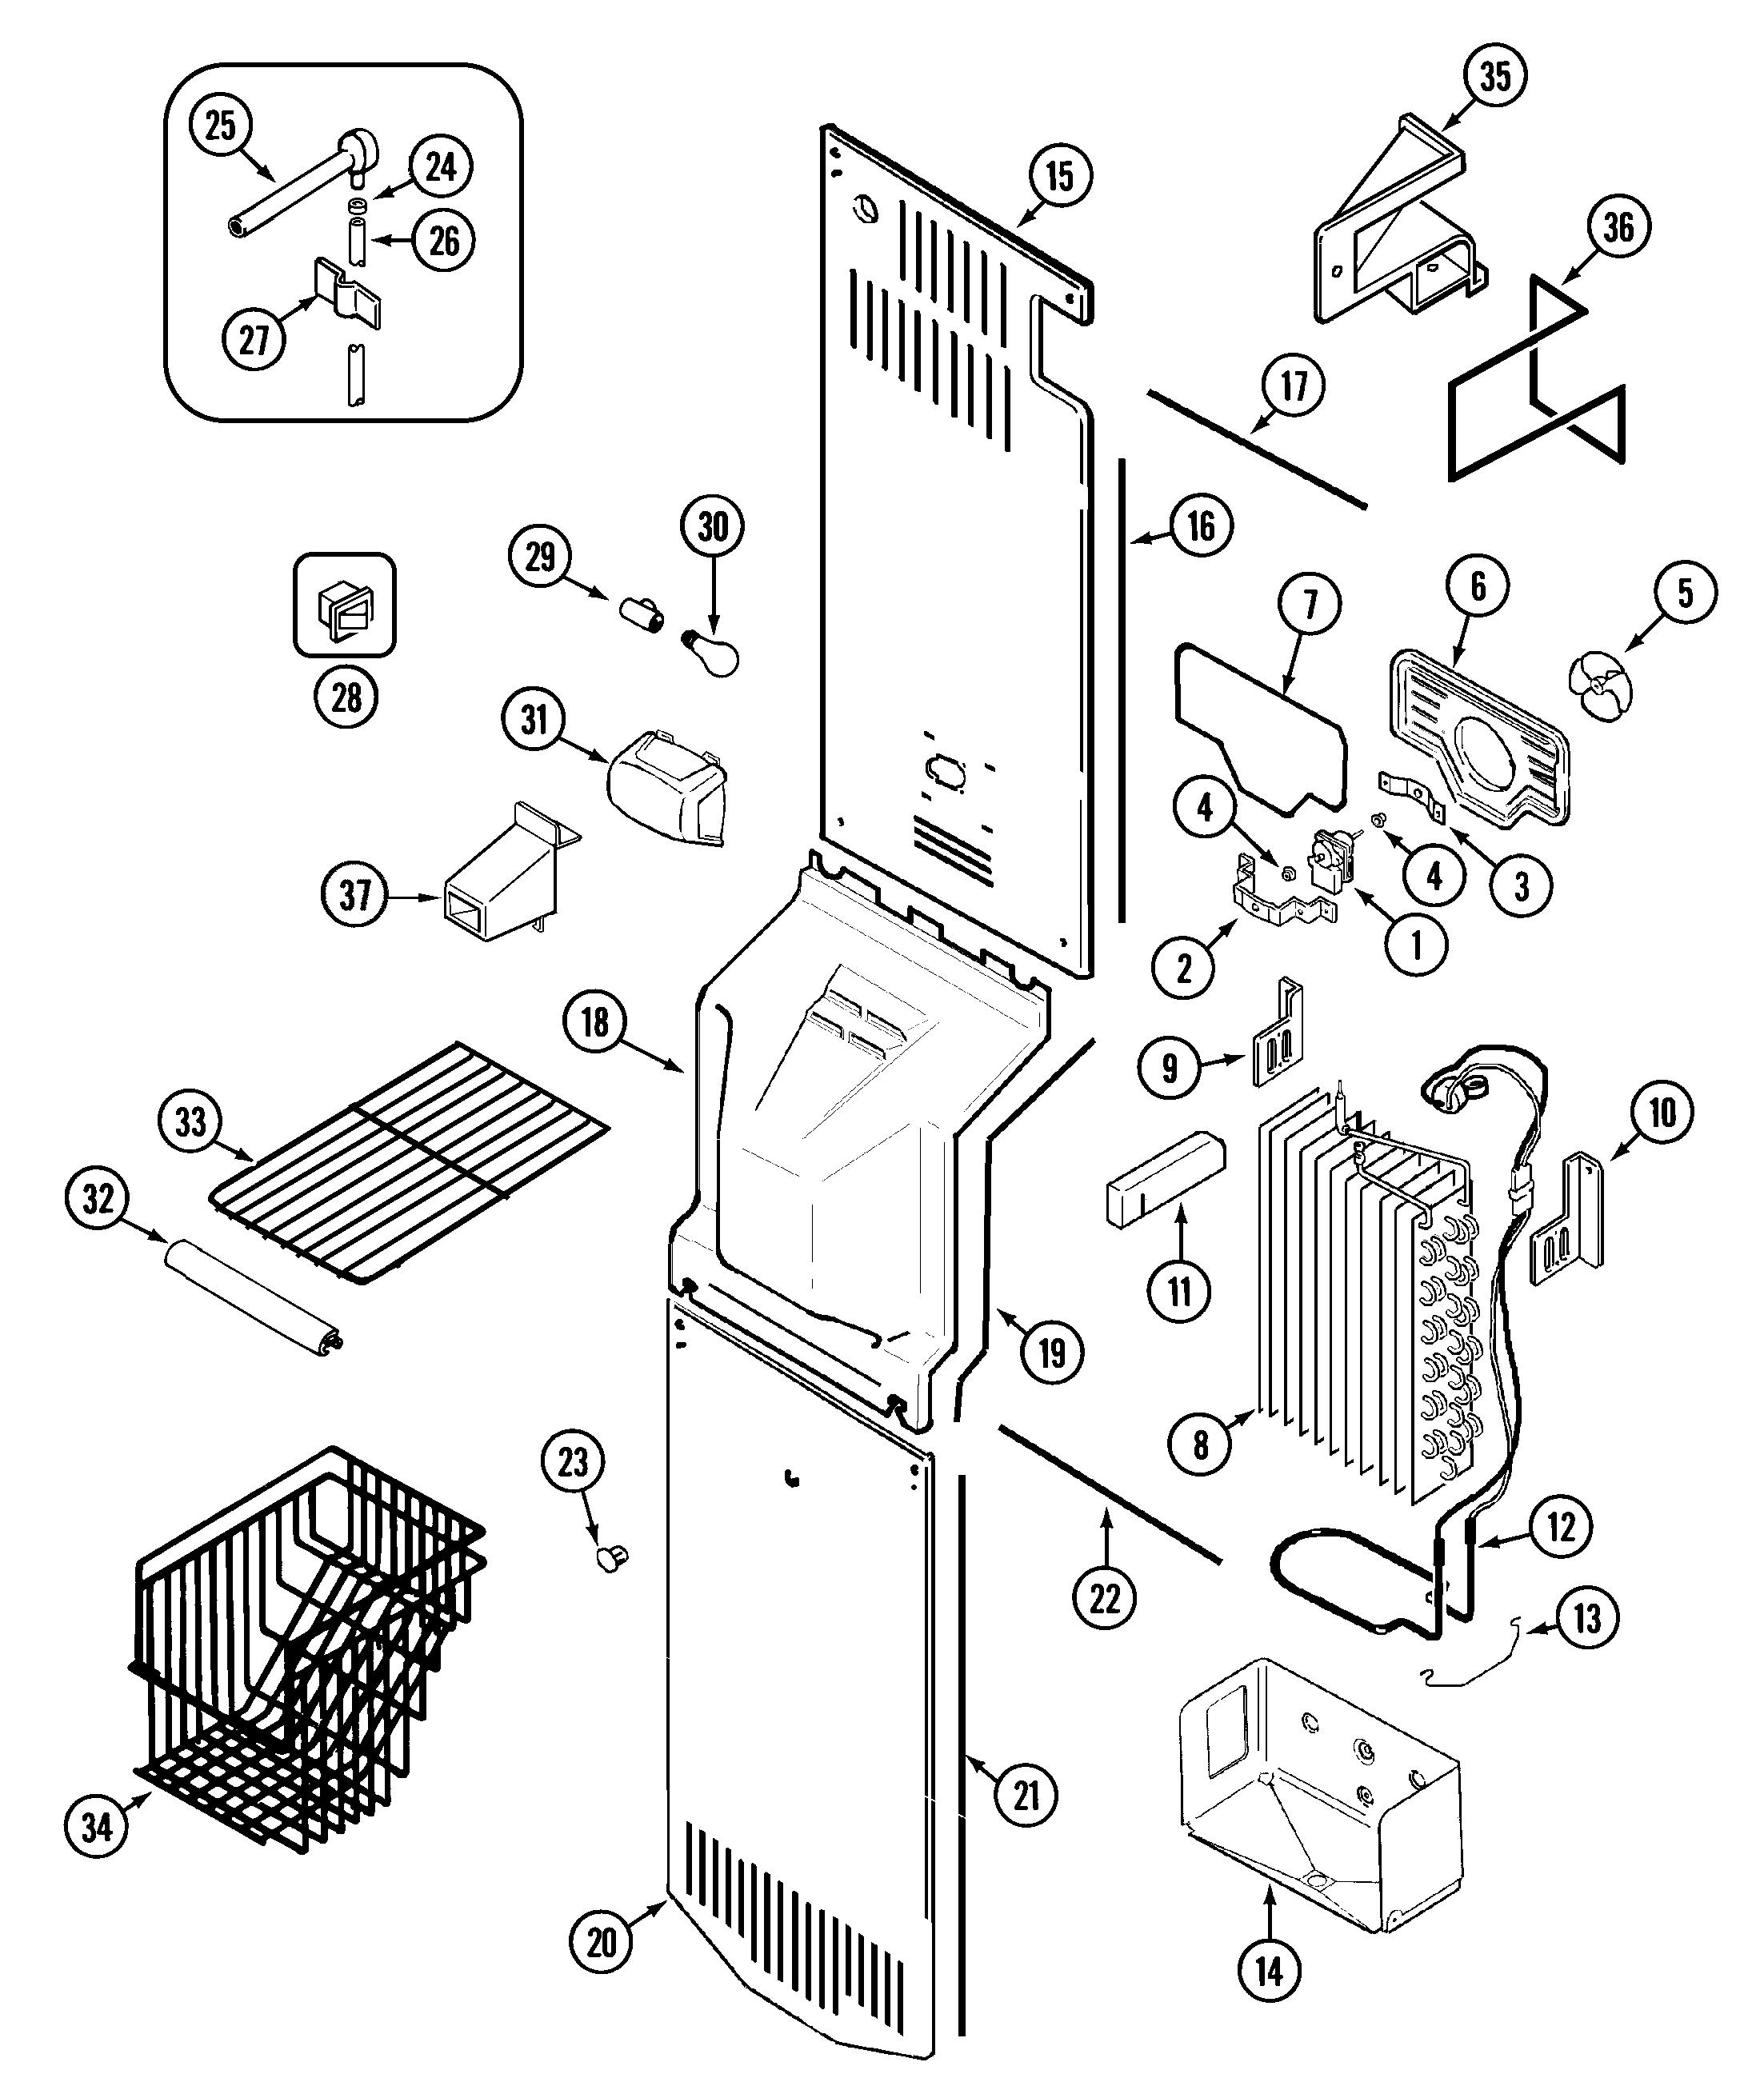 Maytag Side By Side Refrigerator Parts